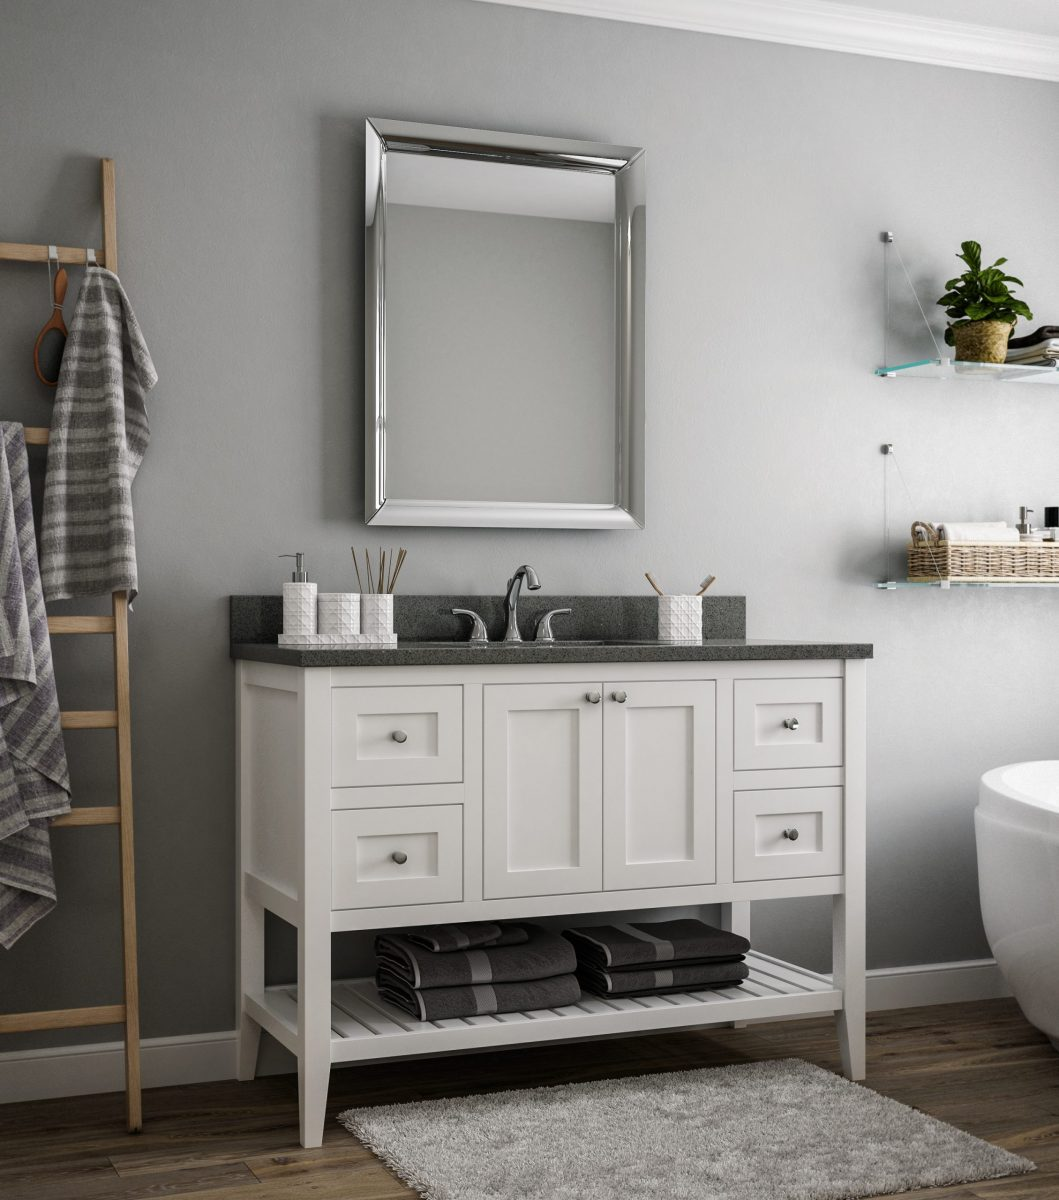 Bathroom Vanity Cabinets | Tampa Cabinet Store